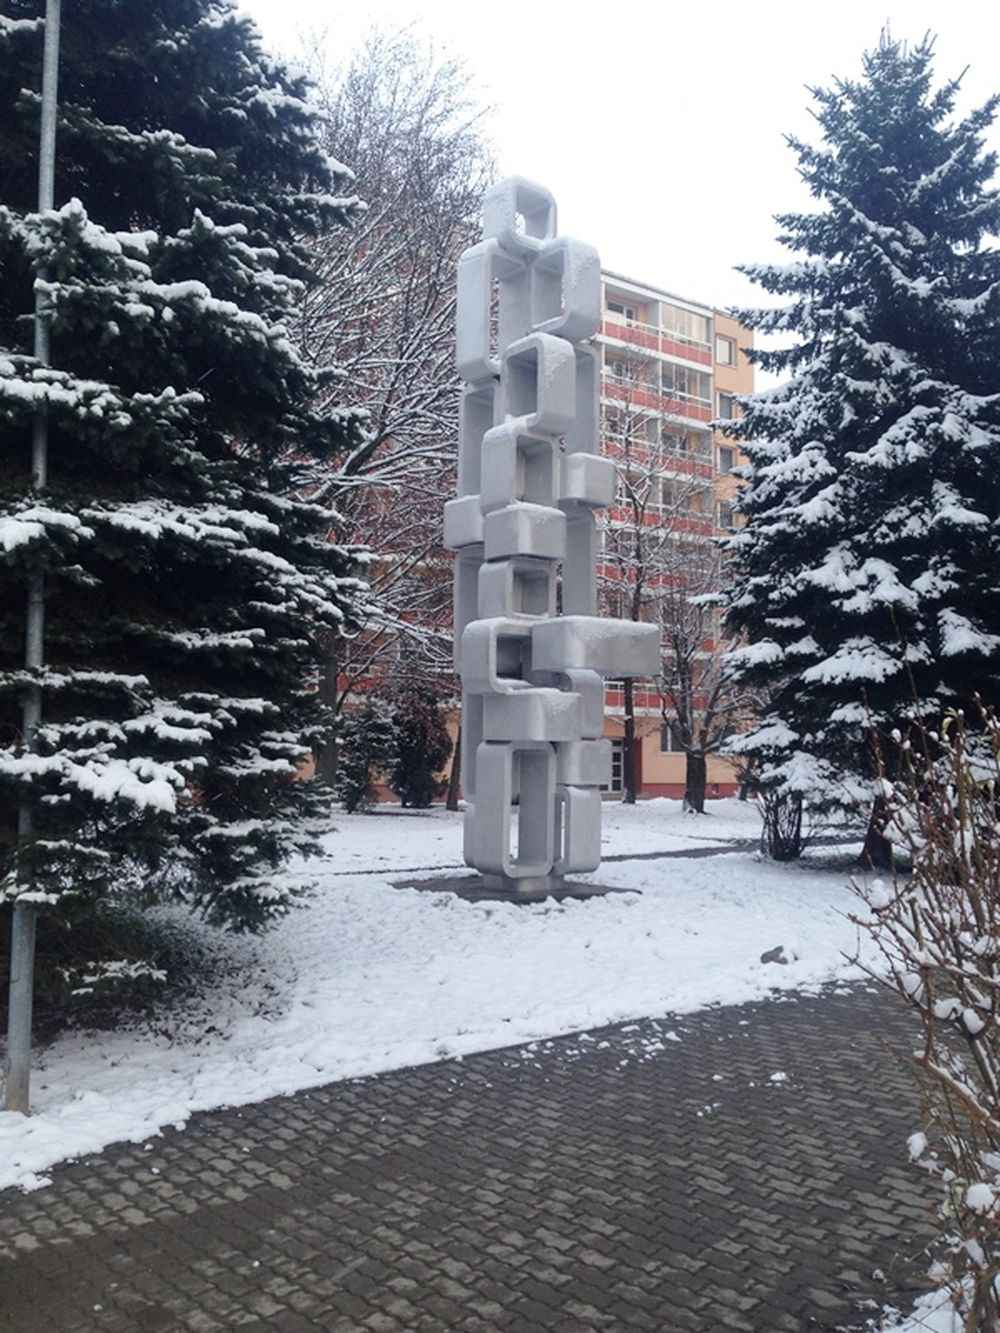 Očistená a zrekonštruovaná socha Bajzova ulica, foto 3